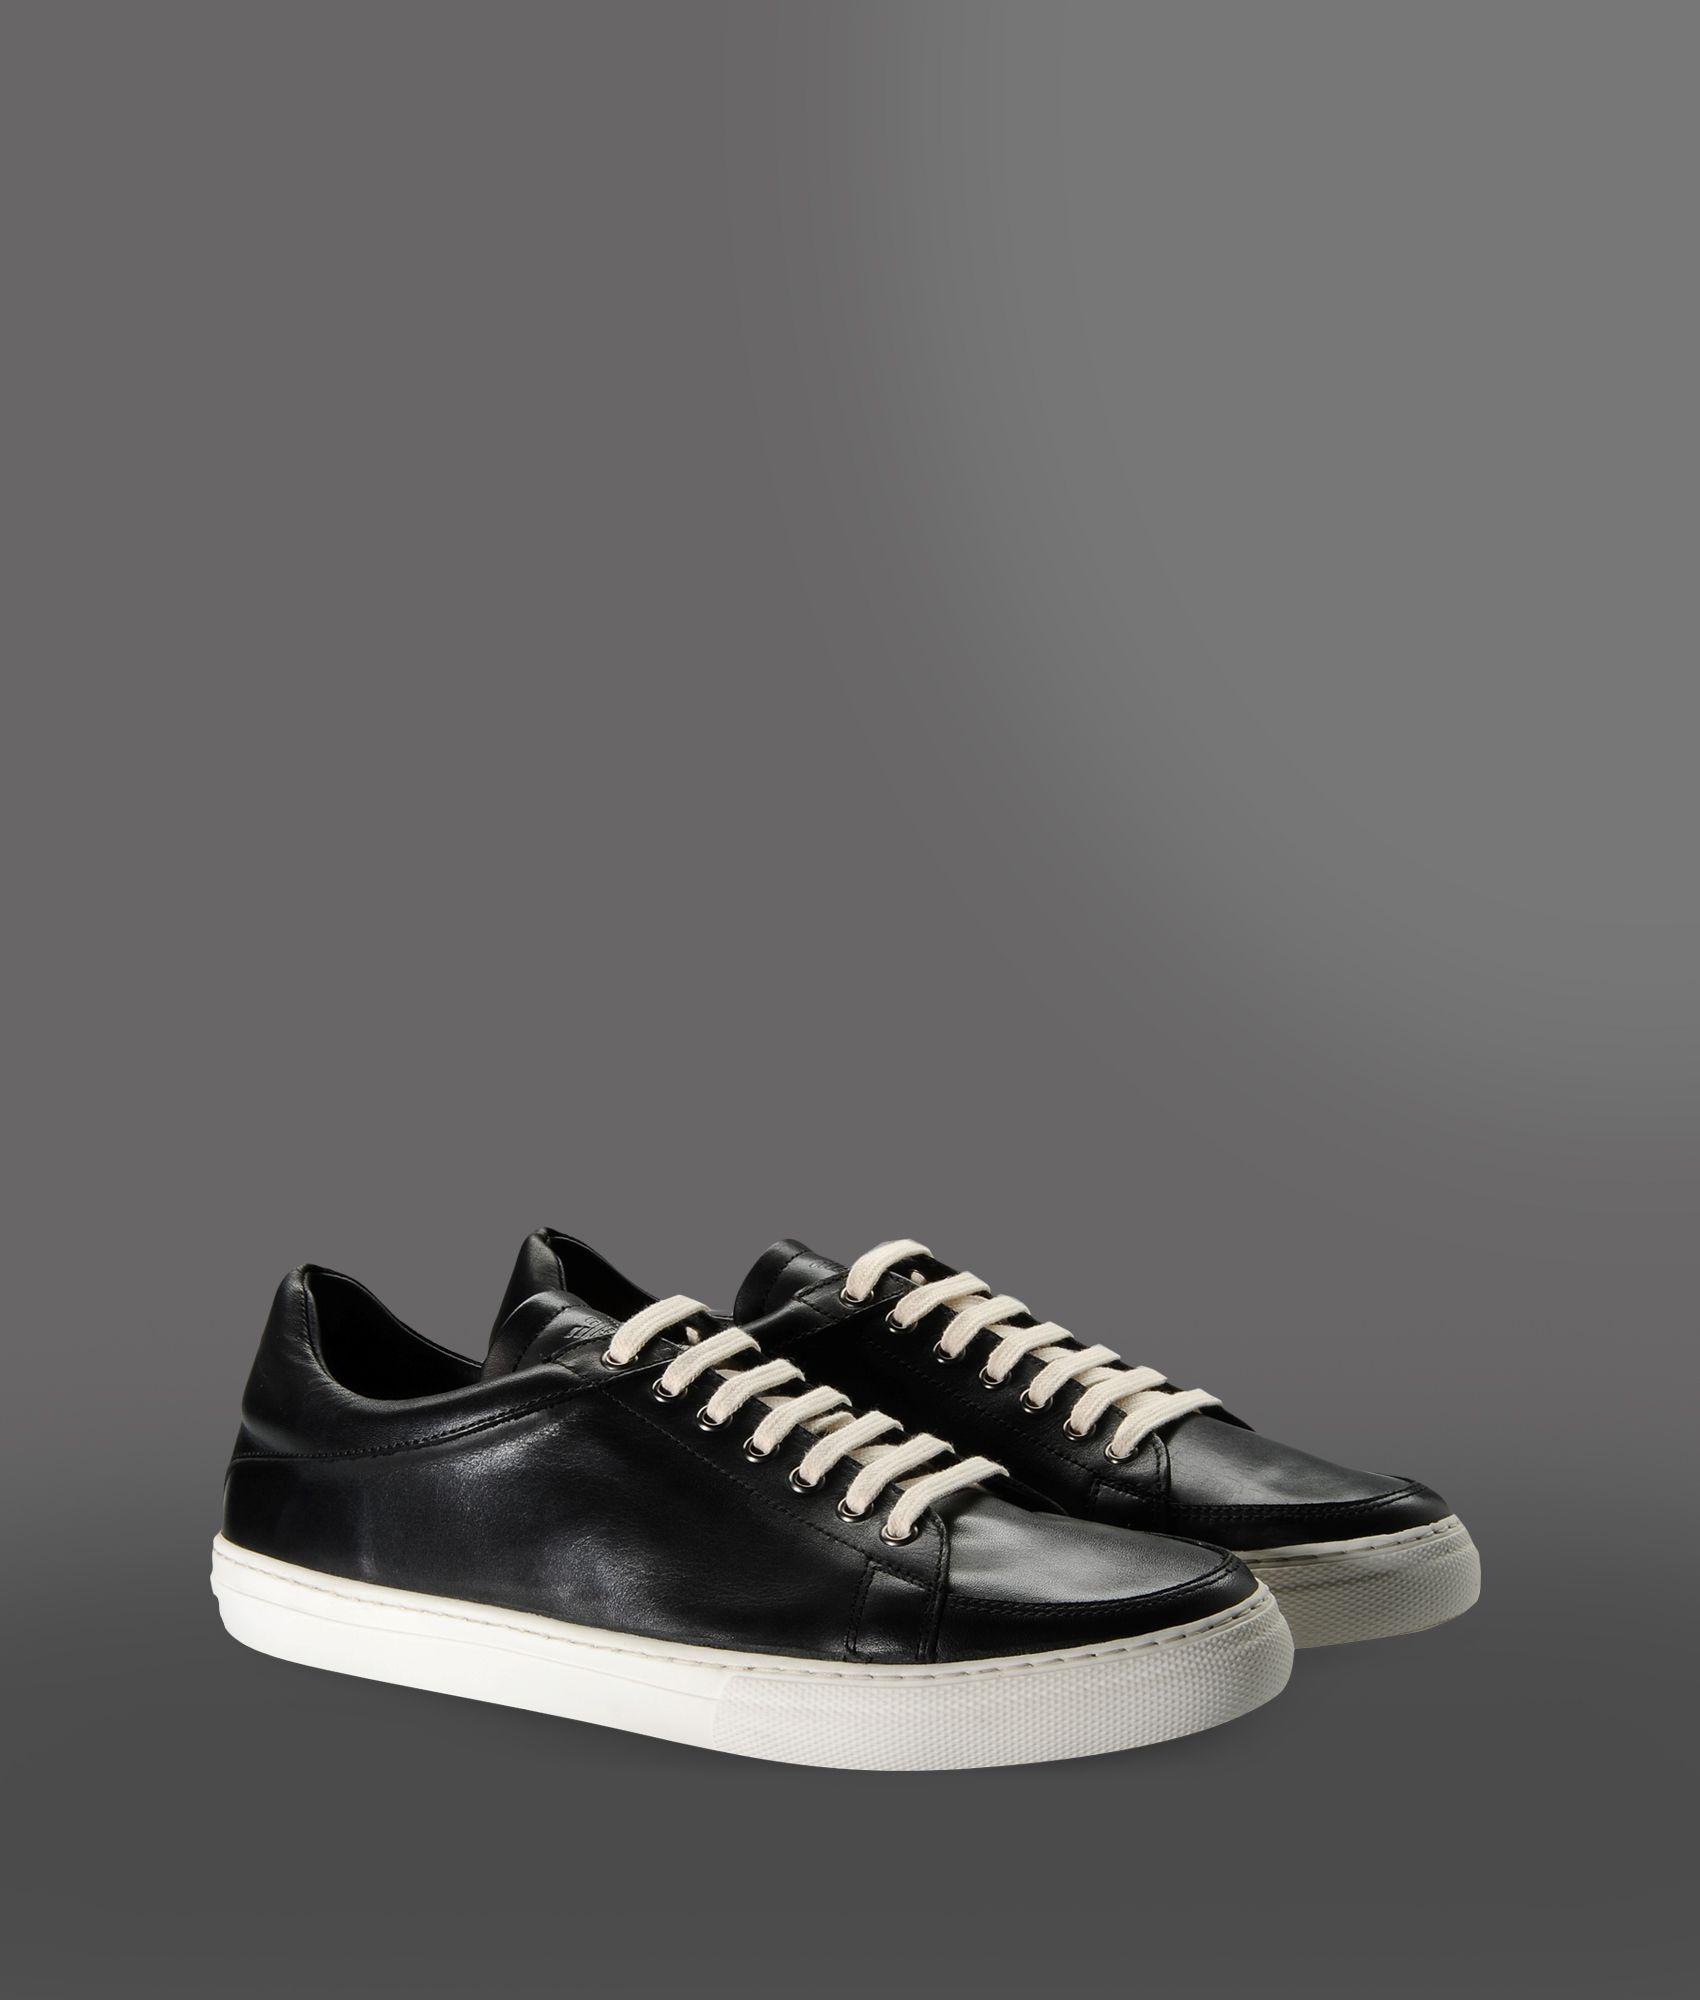 ef6875f5 Emporio Armani Black Sneakers for men